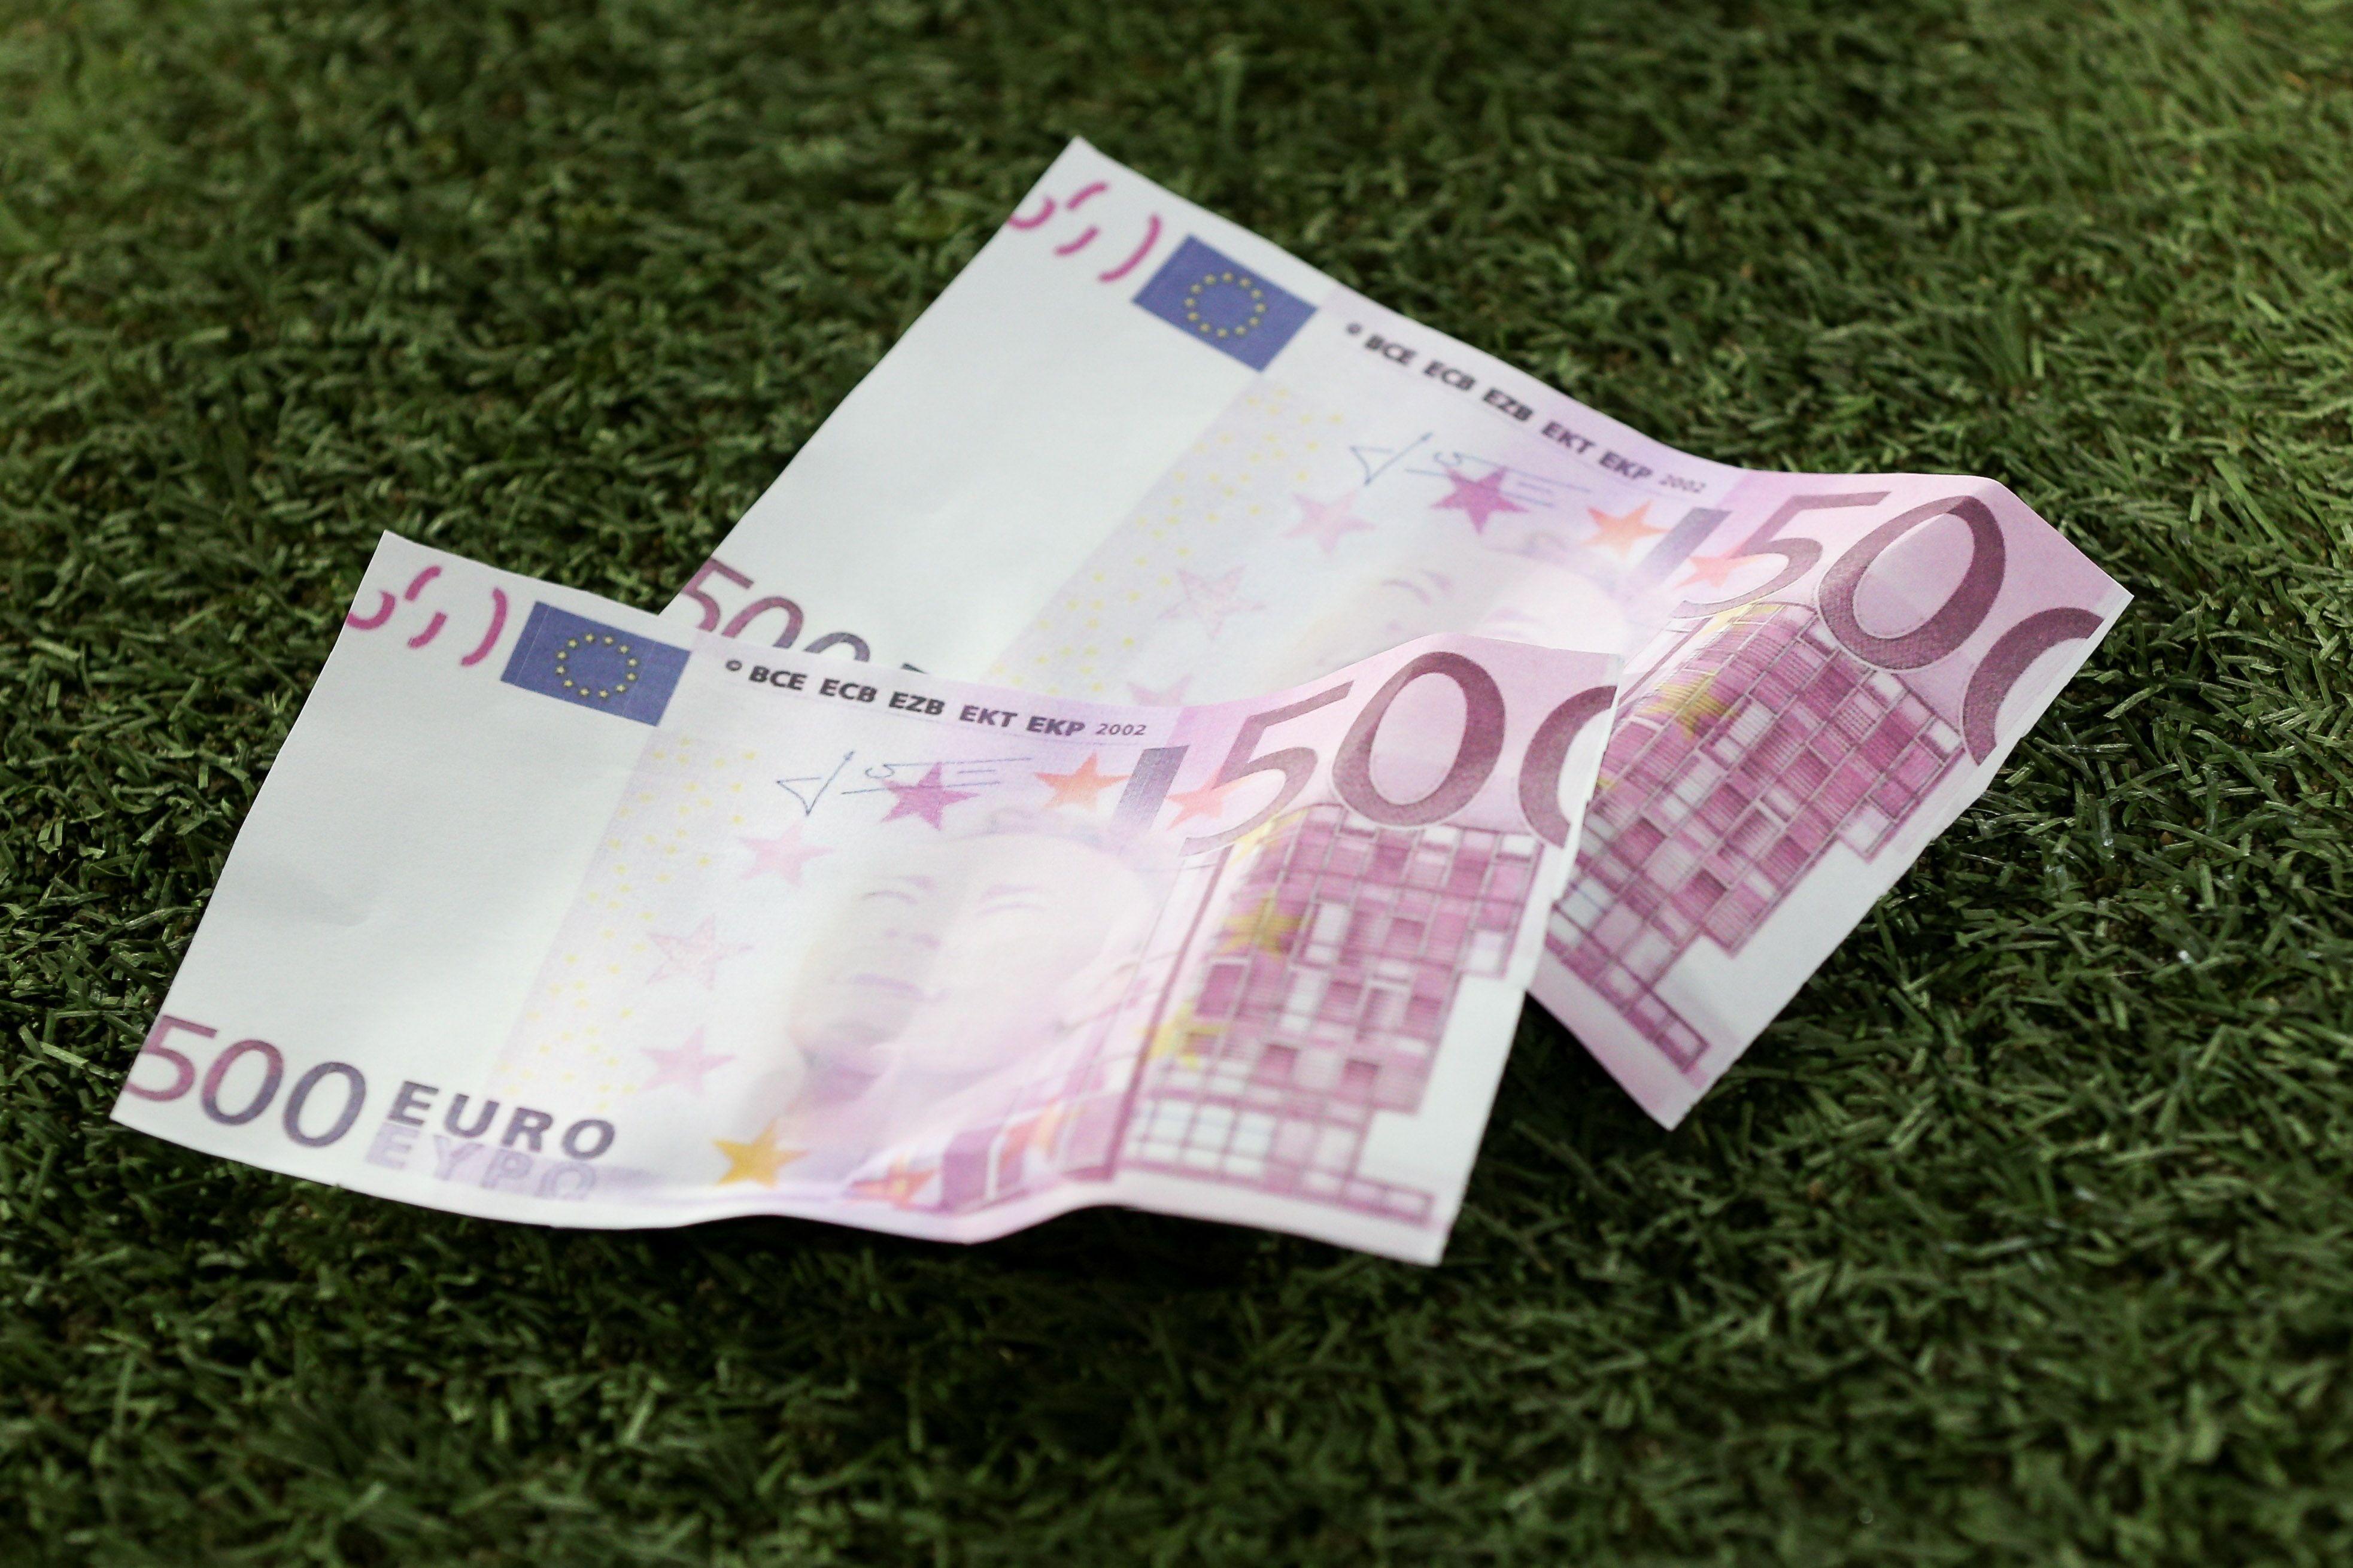 https://i.eurosport.com/2020/03/11/2792980.jpg